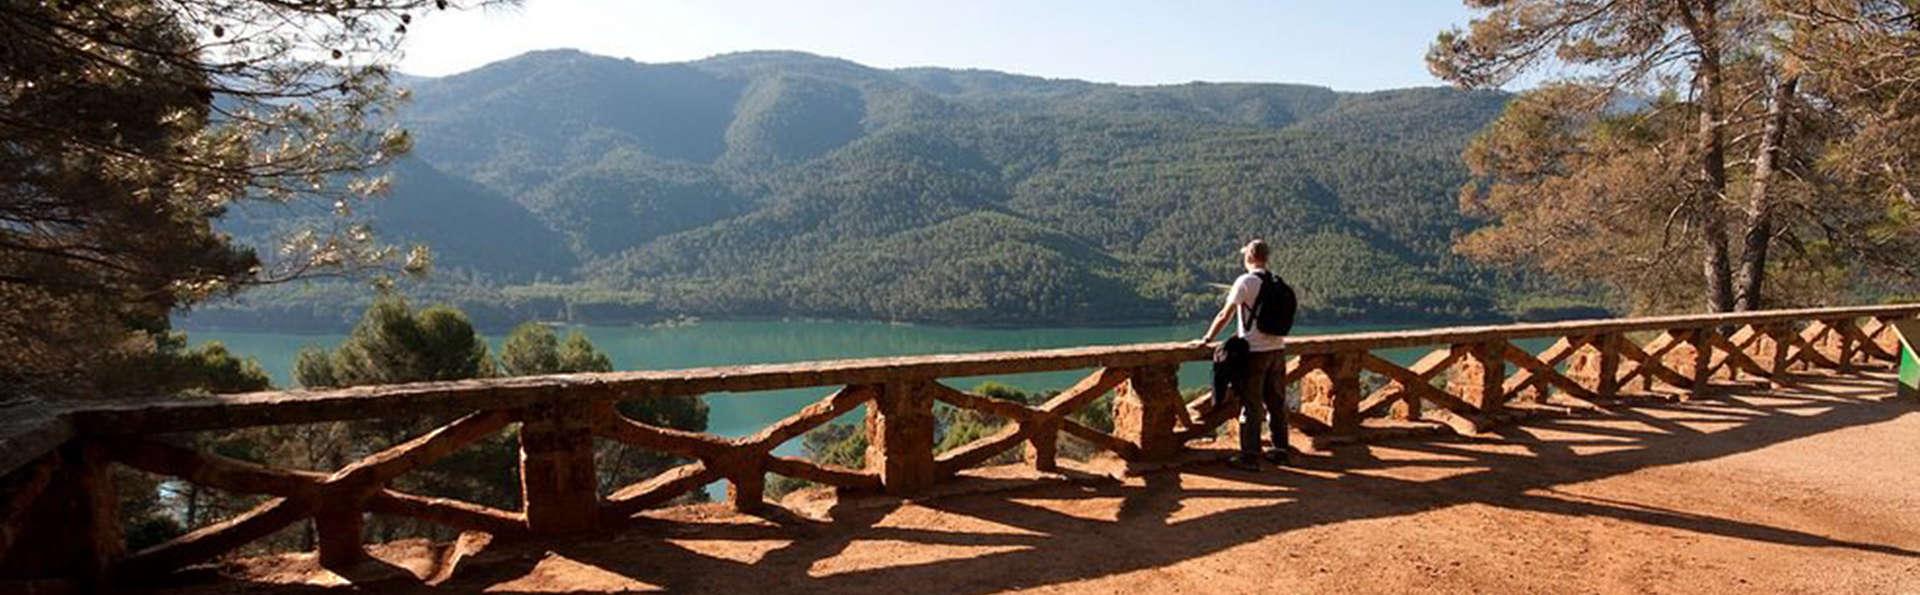 Escapada rural en plena Sierra de Cazorla